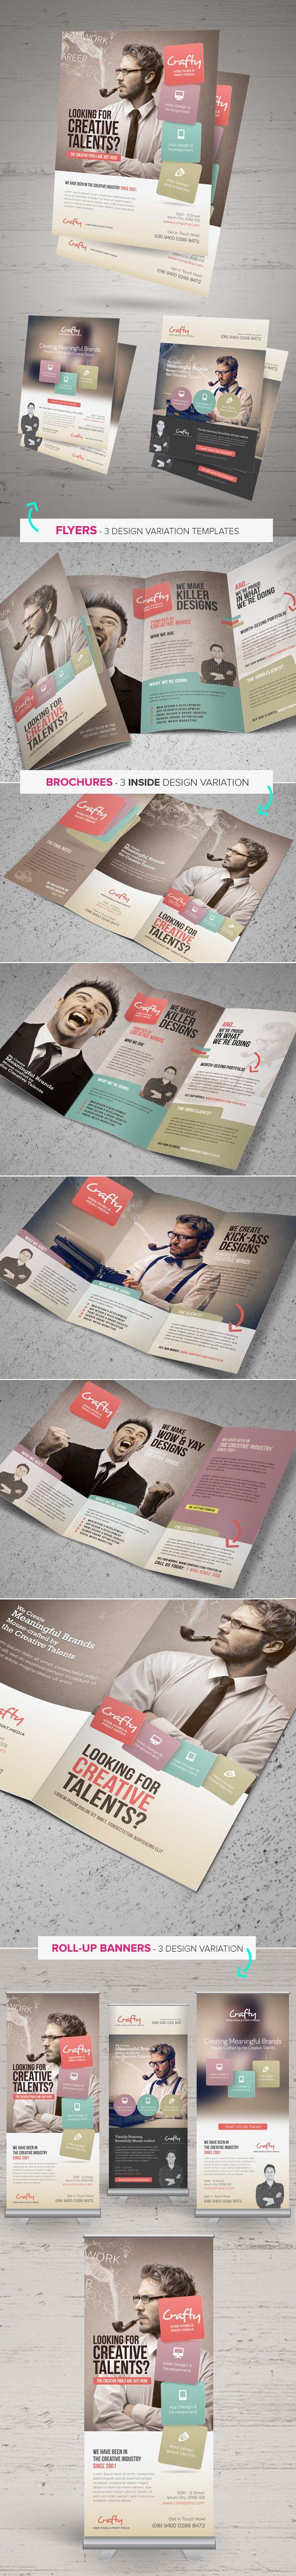 Creative Design Agency Print Bundle by Kinzi Wij, via Behance